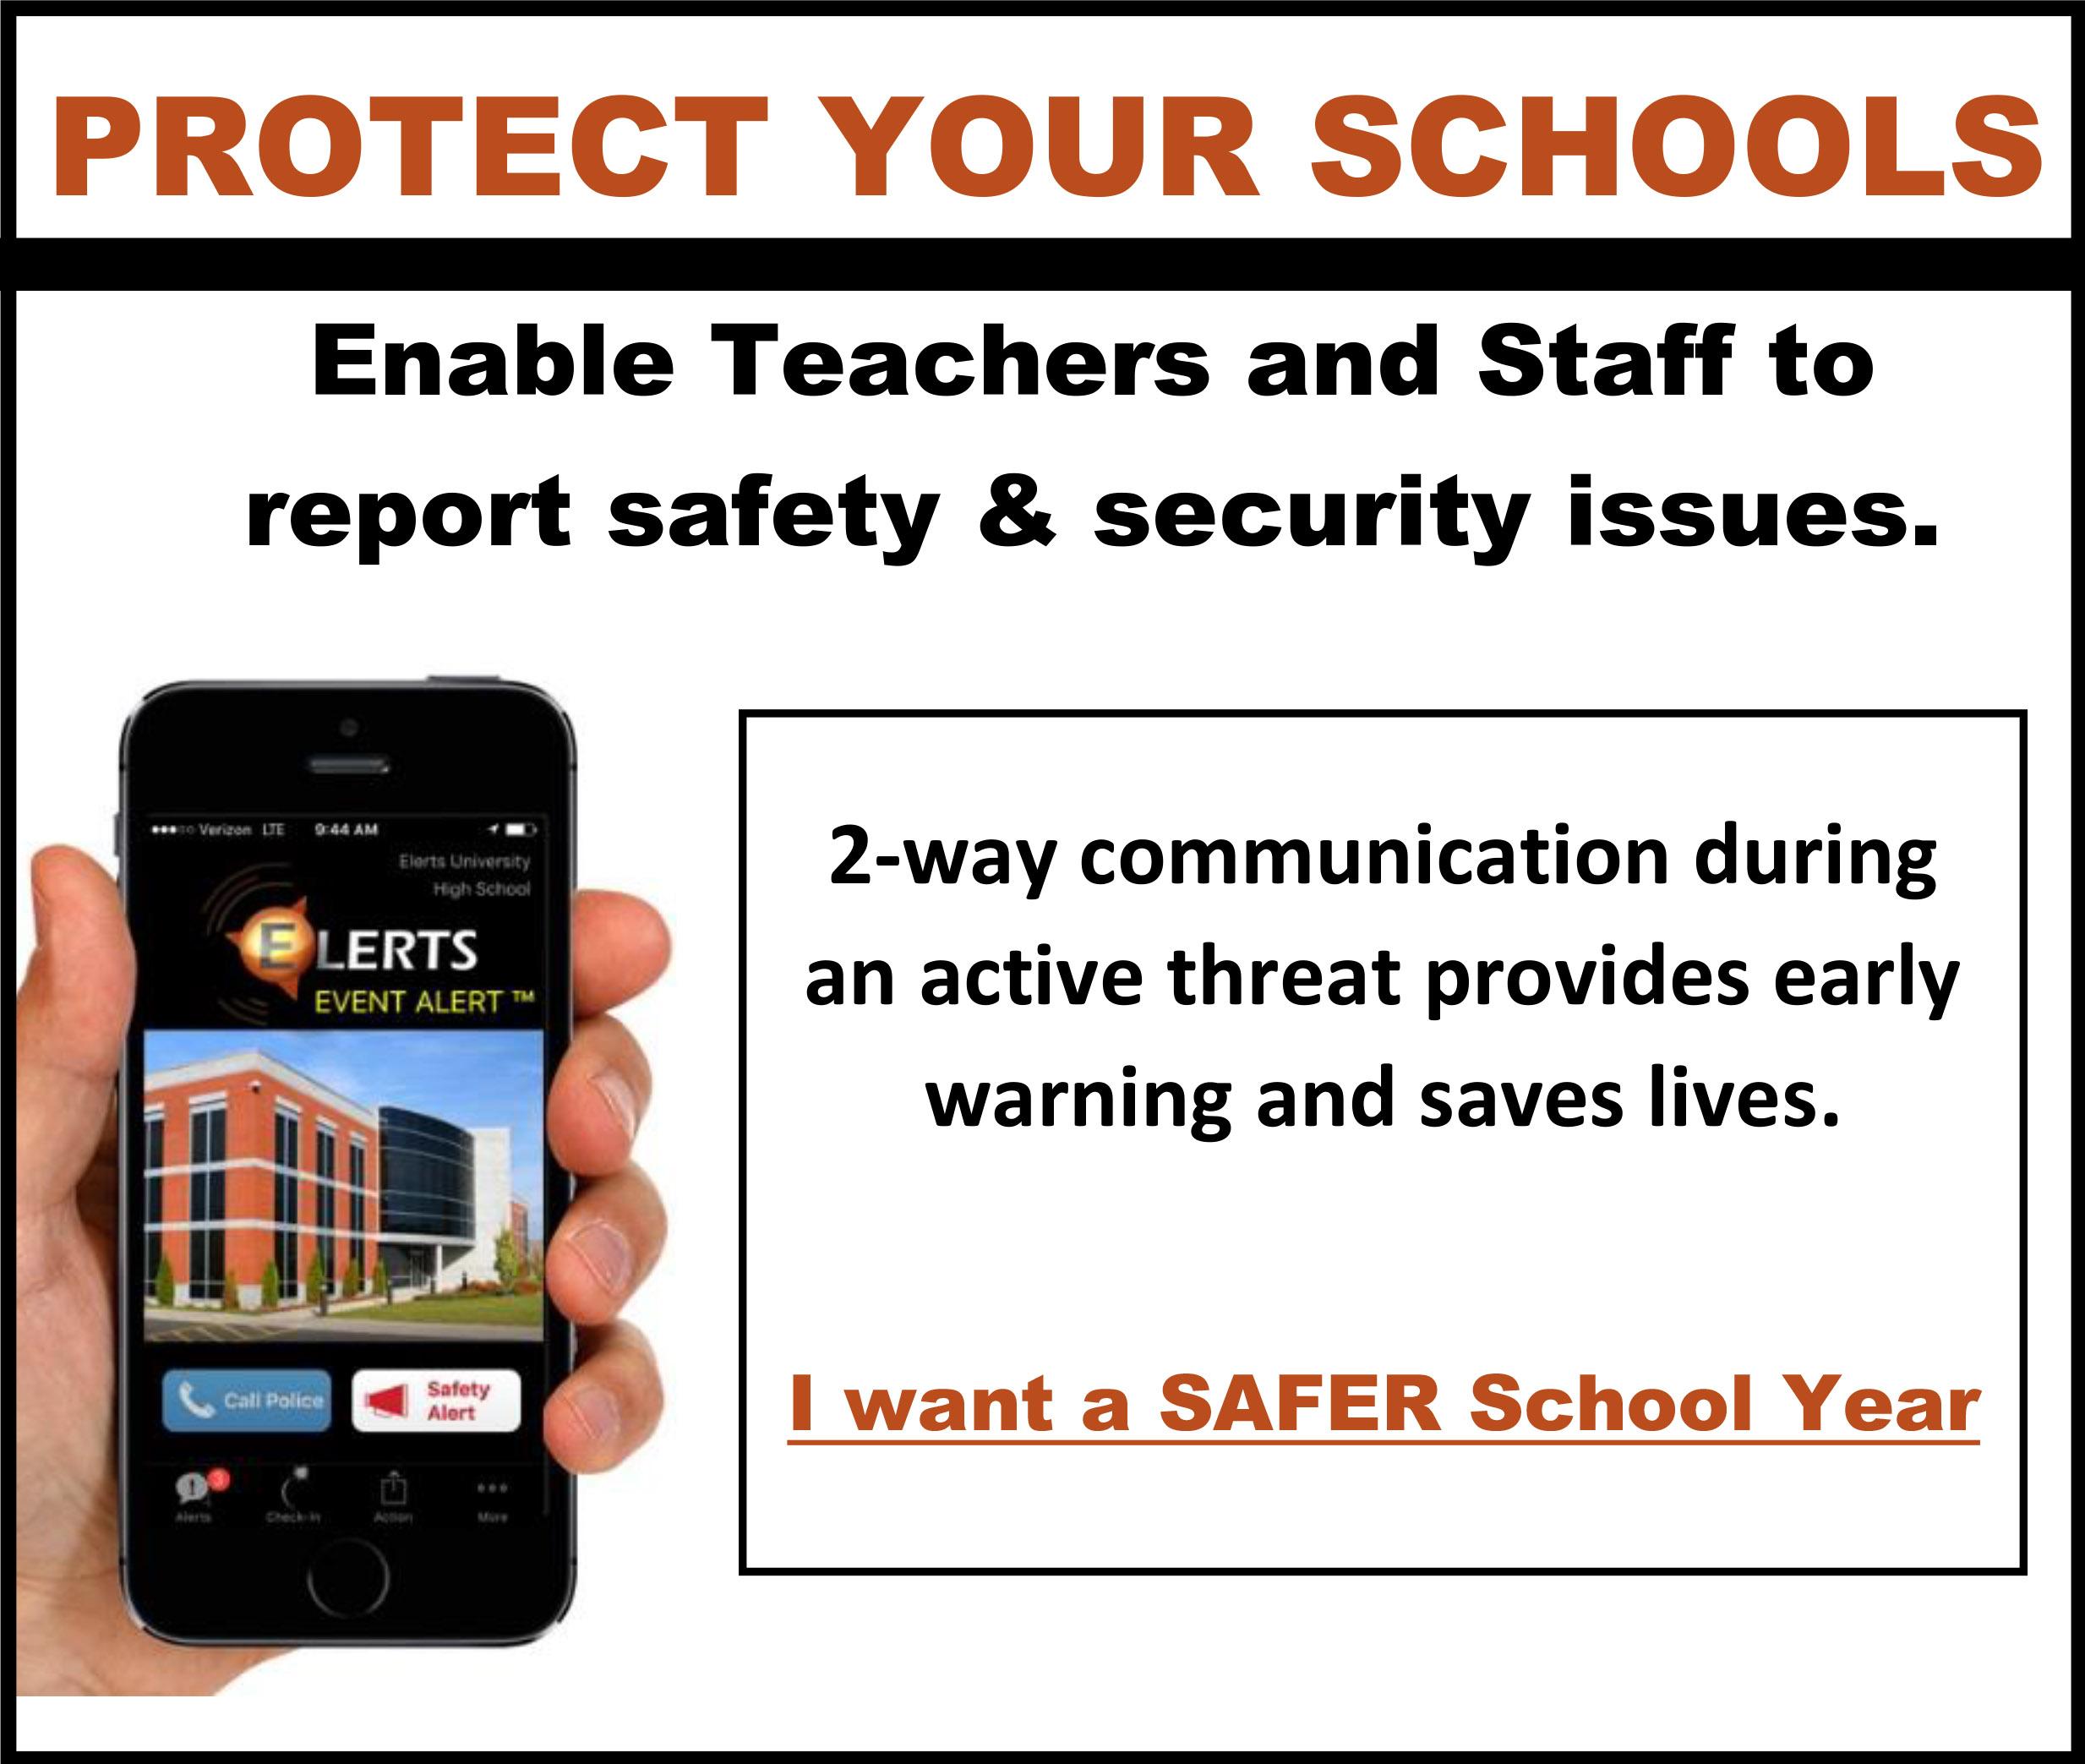 BAck to School Event Alert